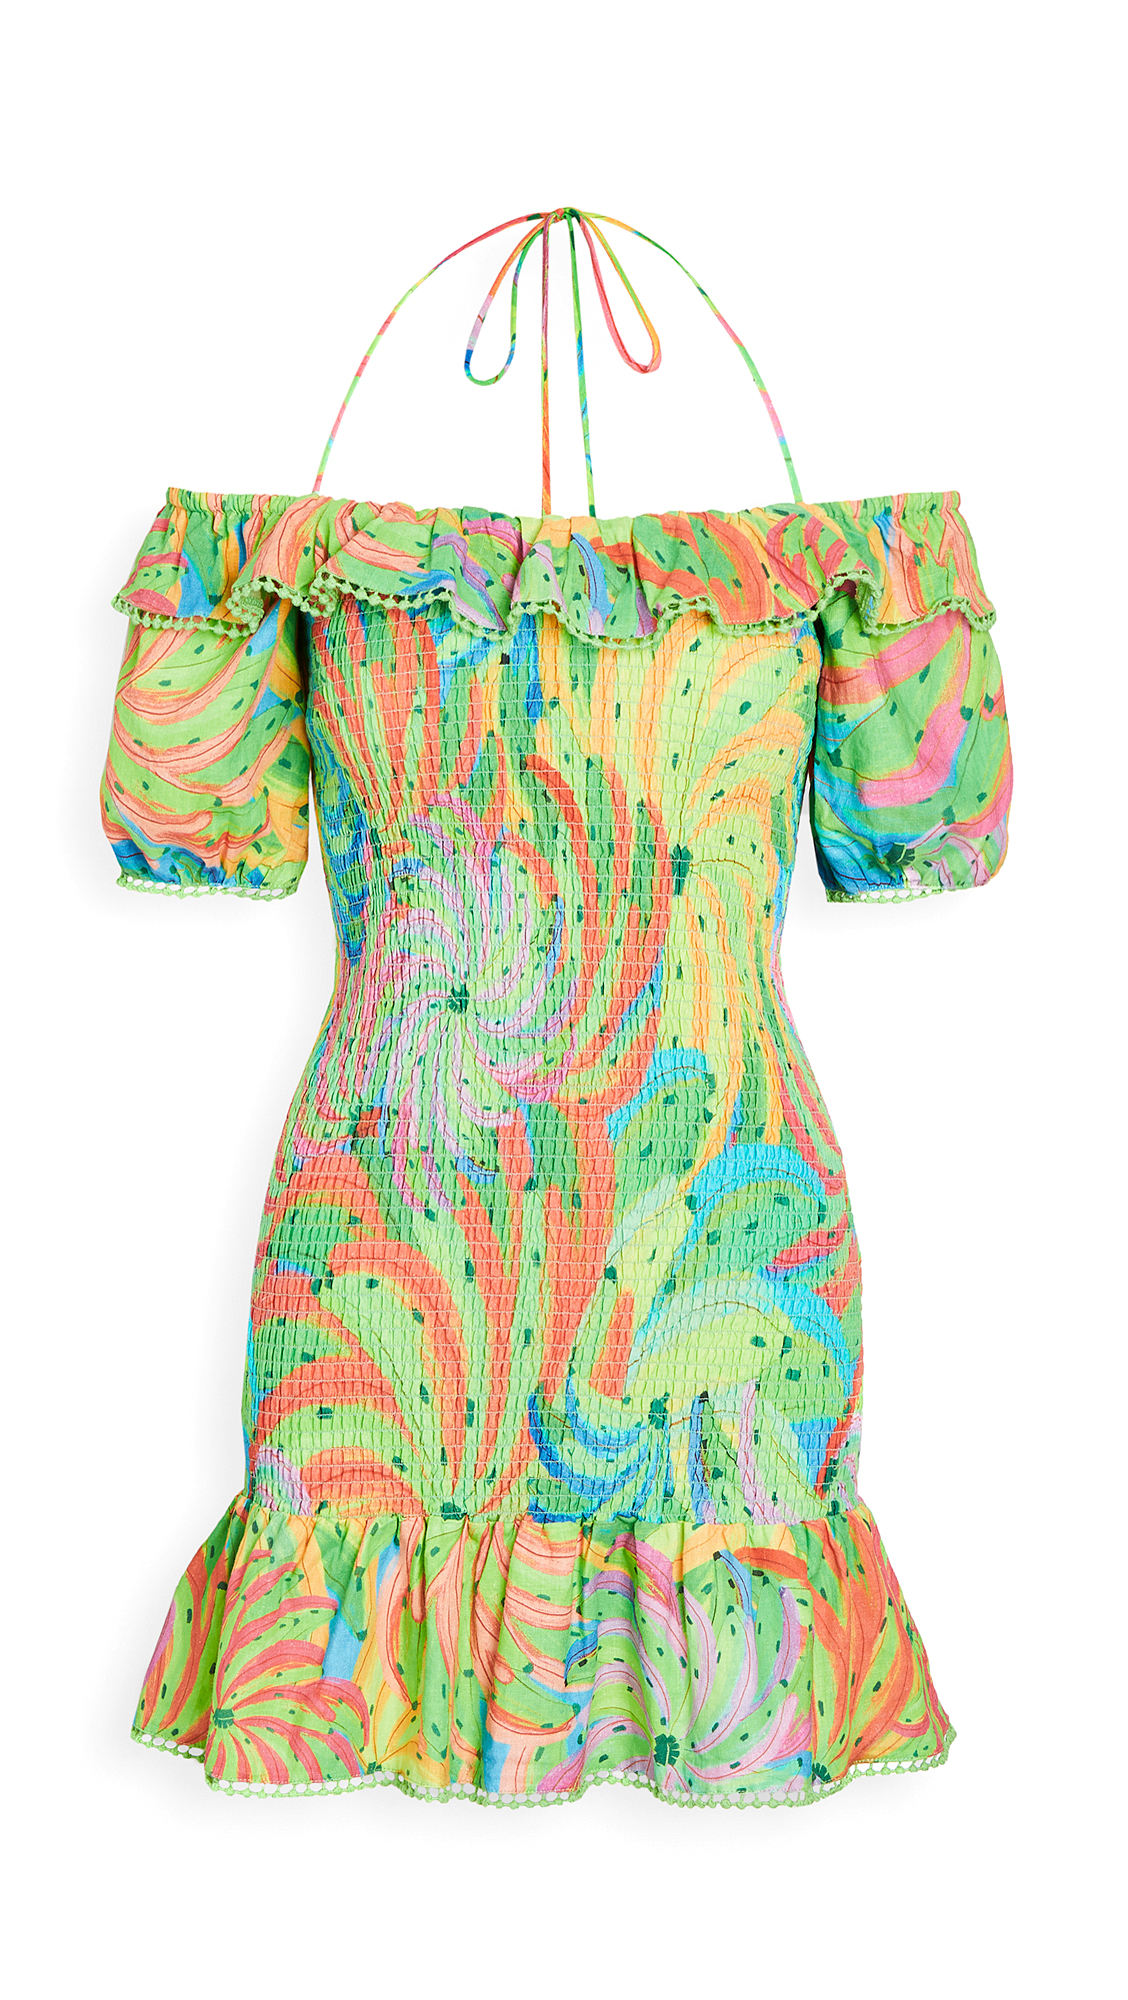 FARM Rio Neon Banana Mini Dress